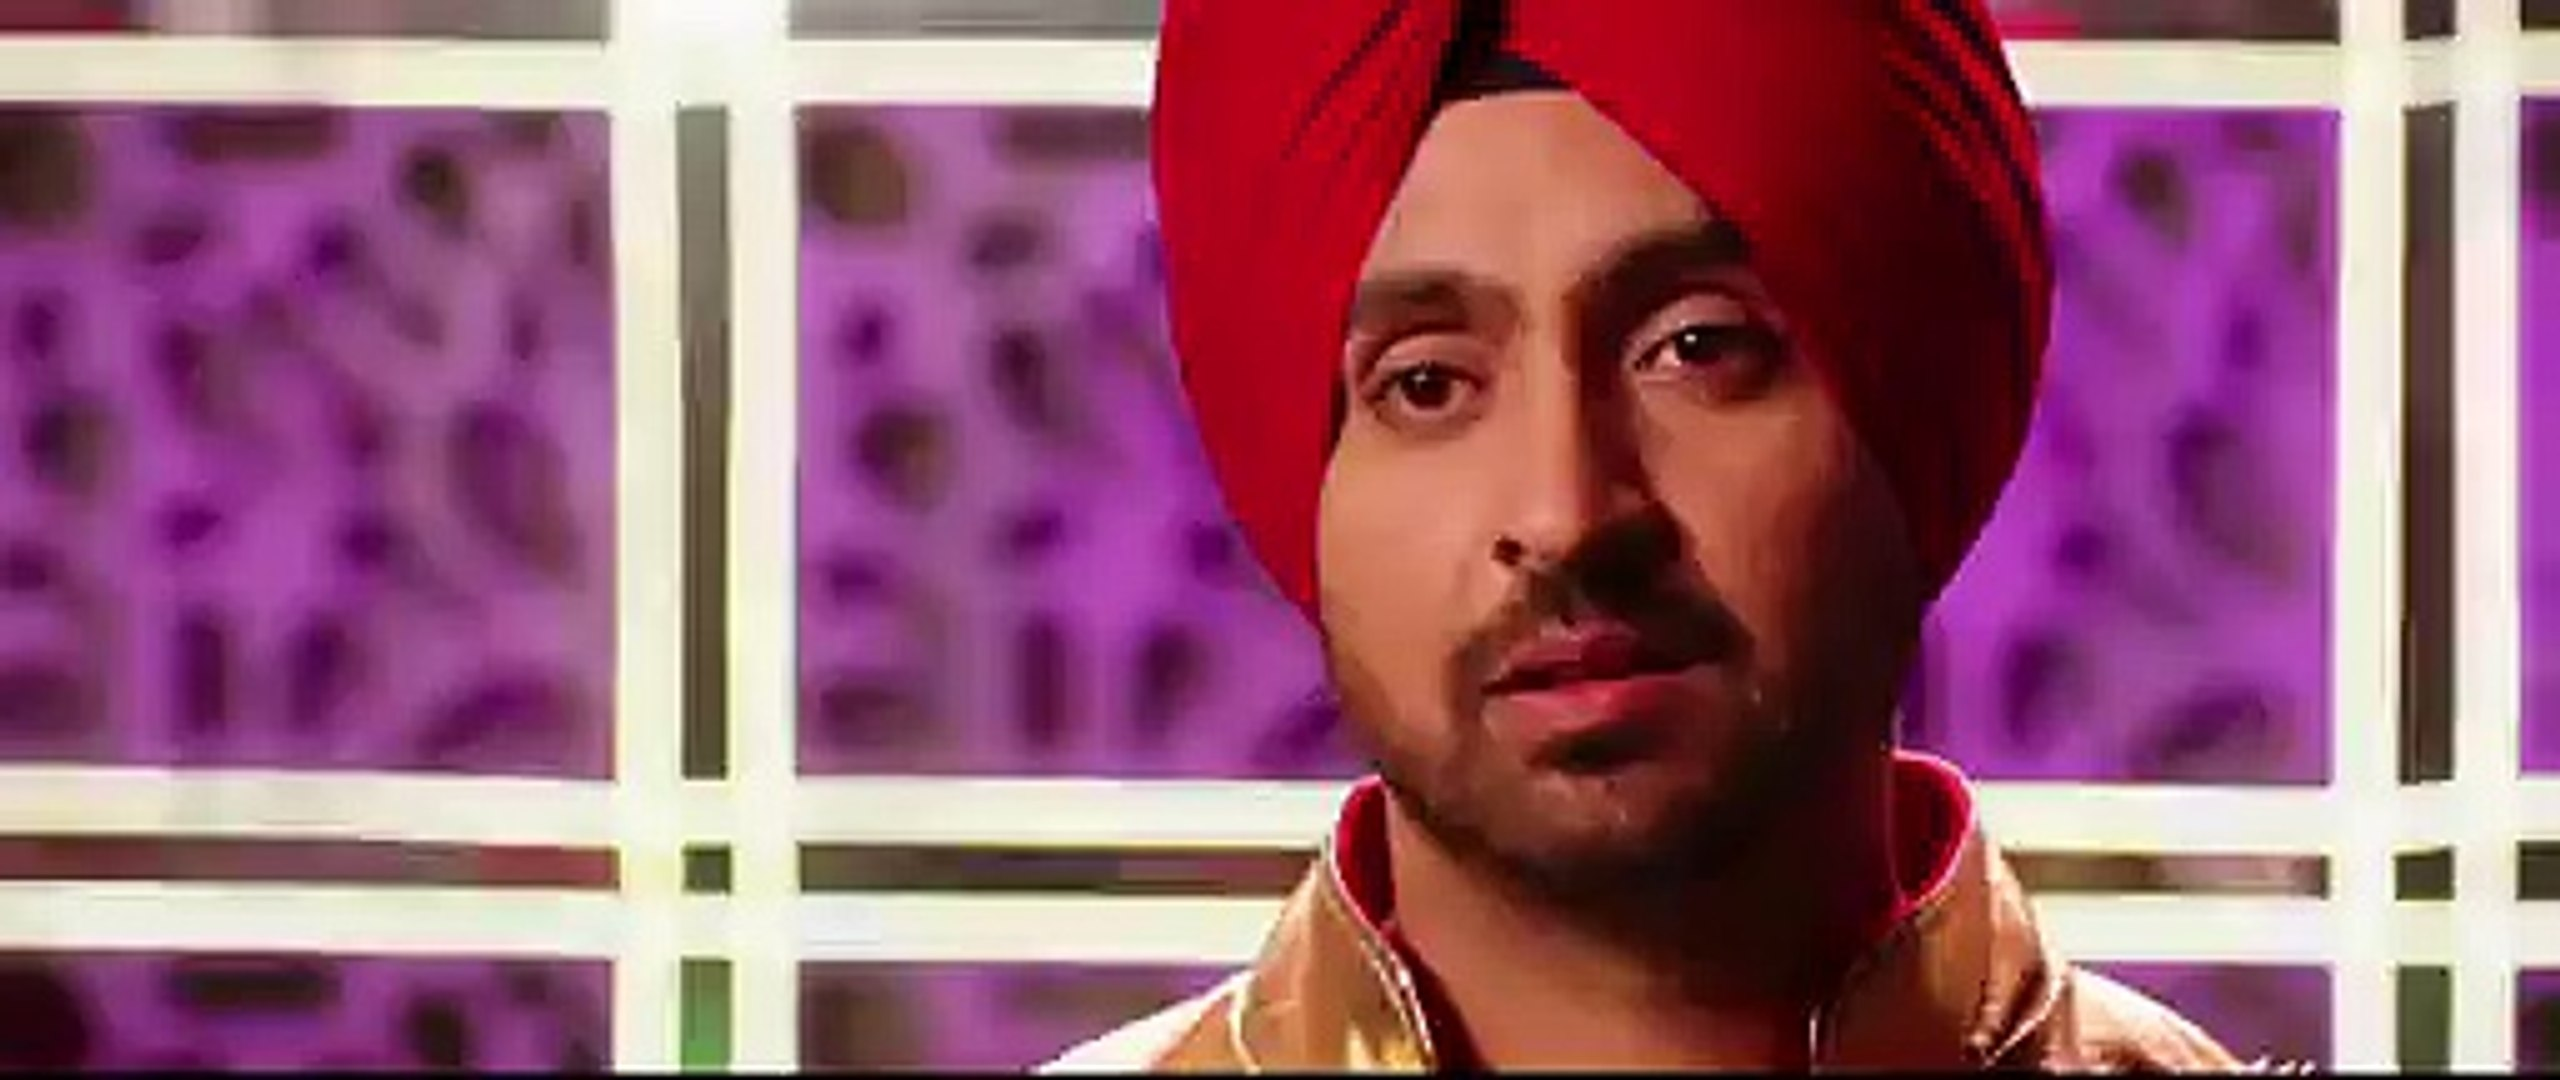 Sweetu Surveen Chawla Songs Latest New Punjabi Songs 2015 New Latest Hindi Bollywood Songs 2015 HD t